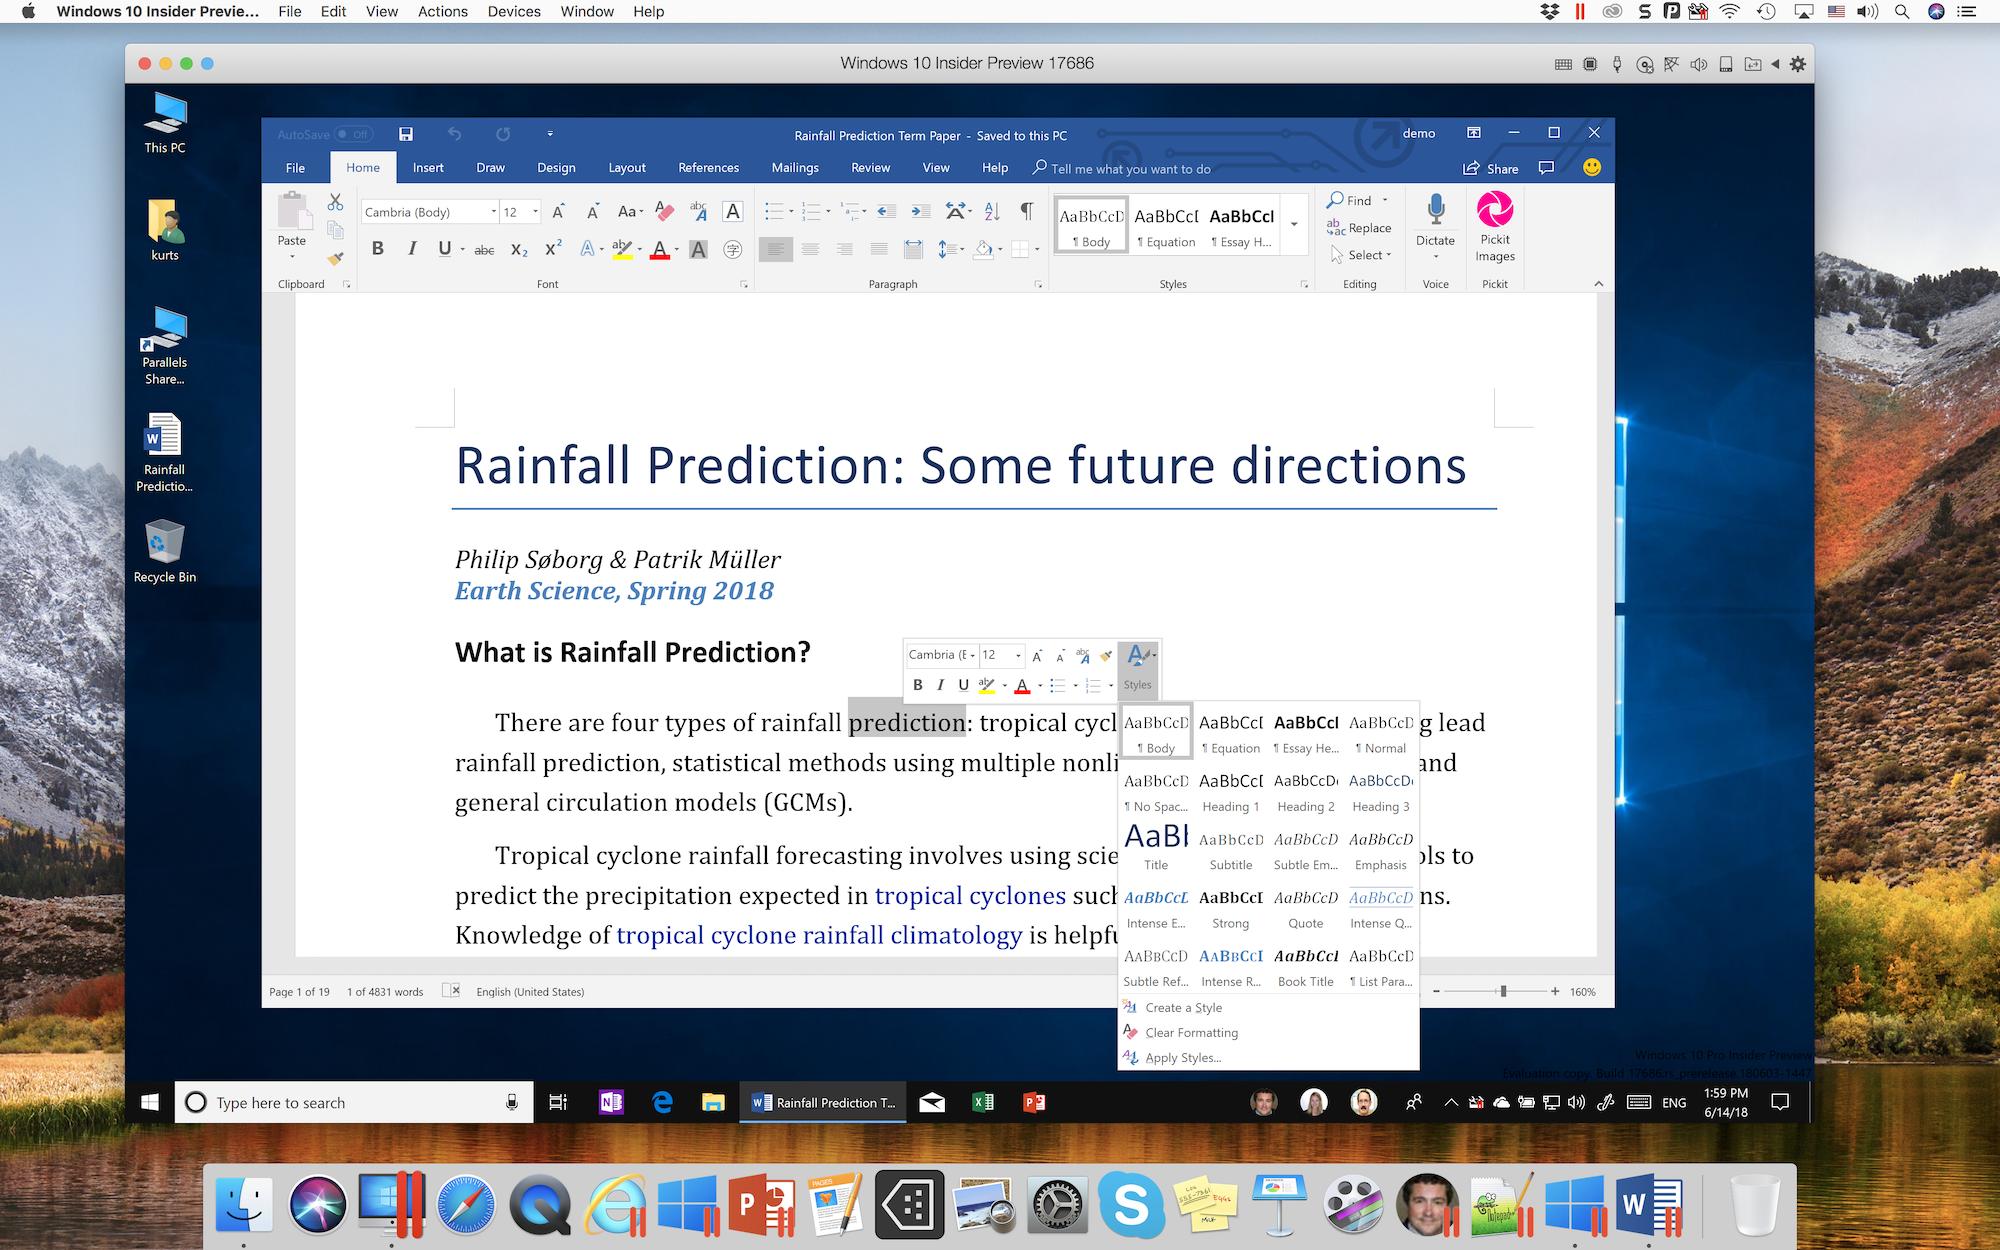 How to downgrade Parallels Desktop?